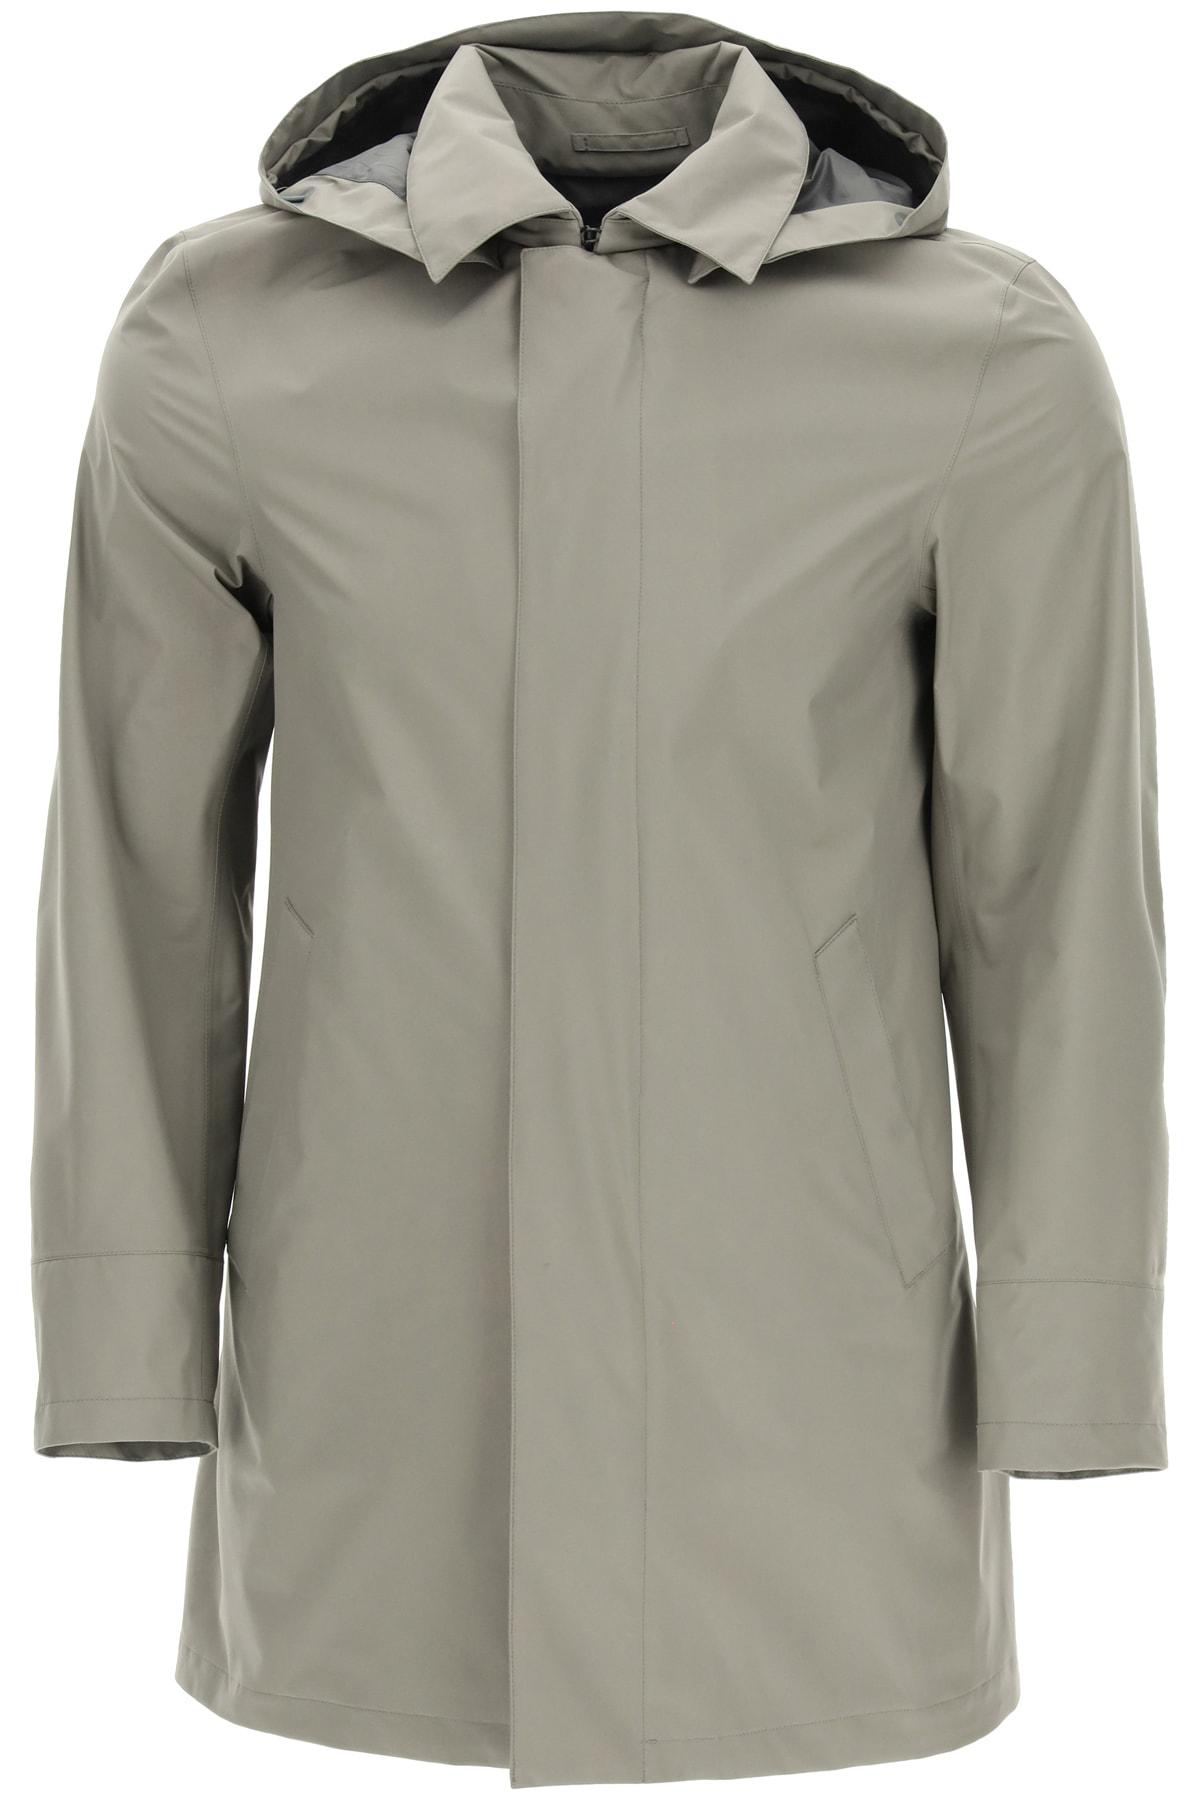 Windbreaker Jacket Gore-tex Laminar